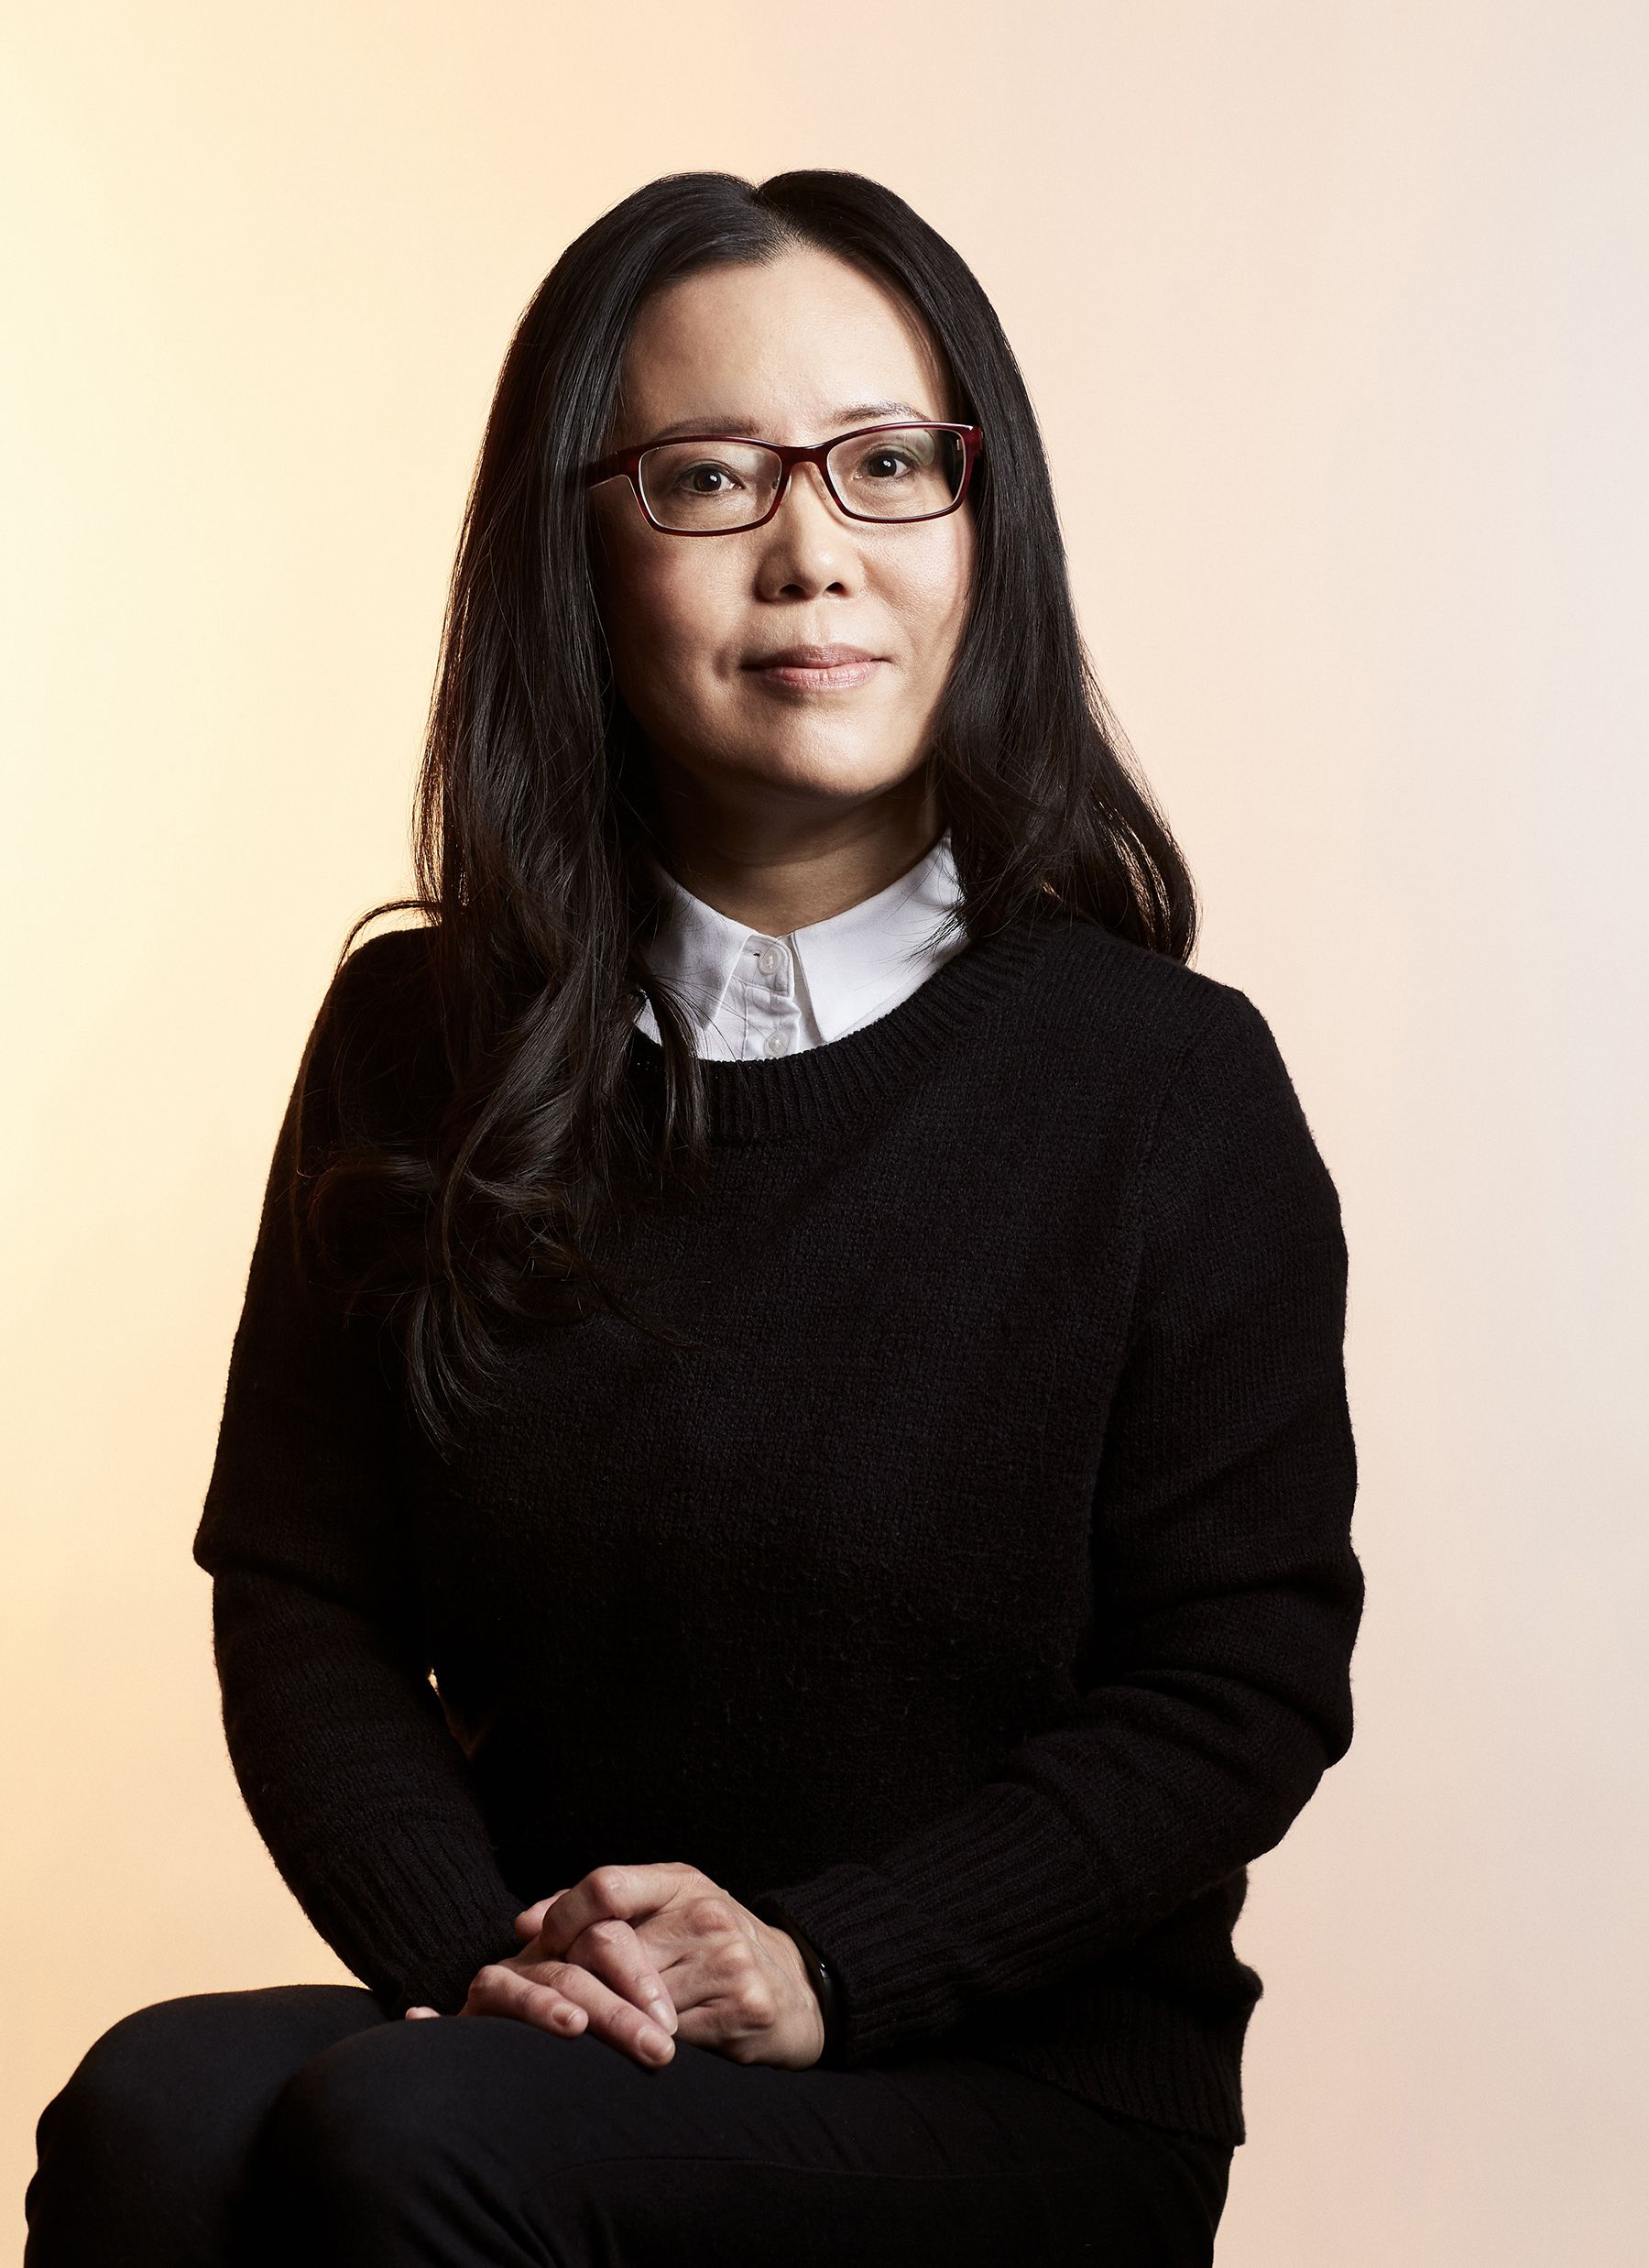 Dr shen photo